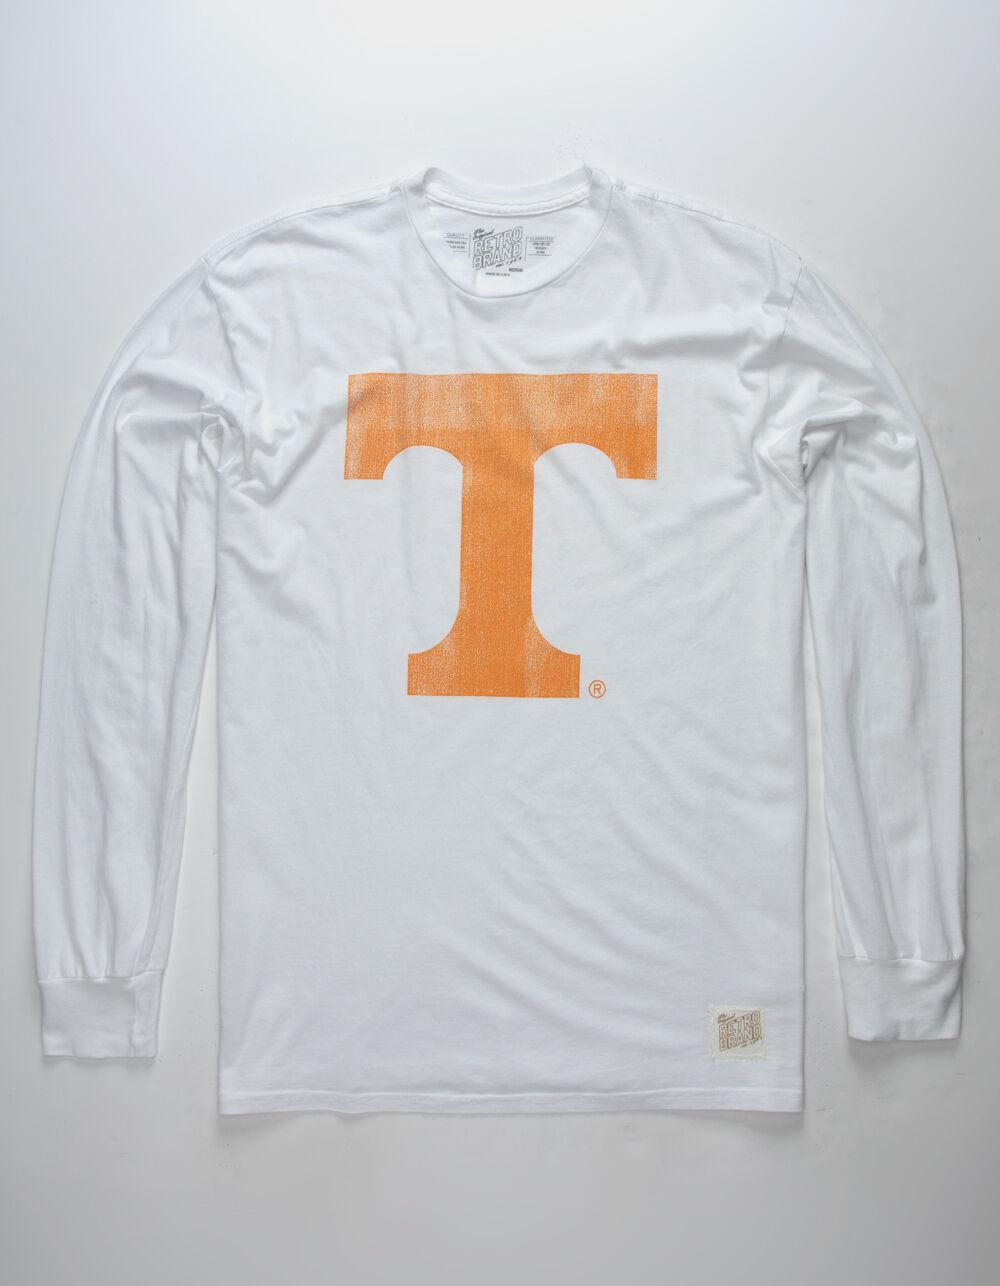 RETRO BRAND University Of Tennessee T-Shirt